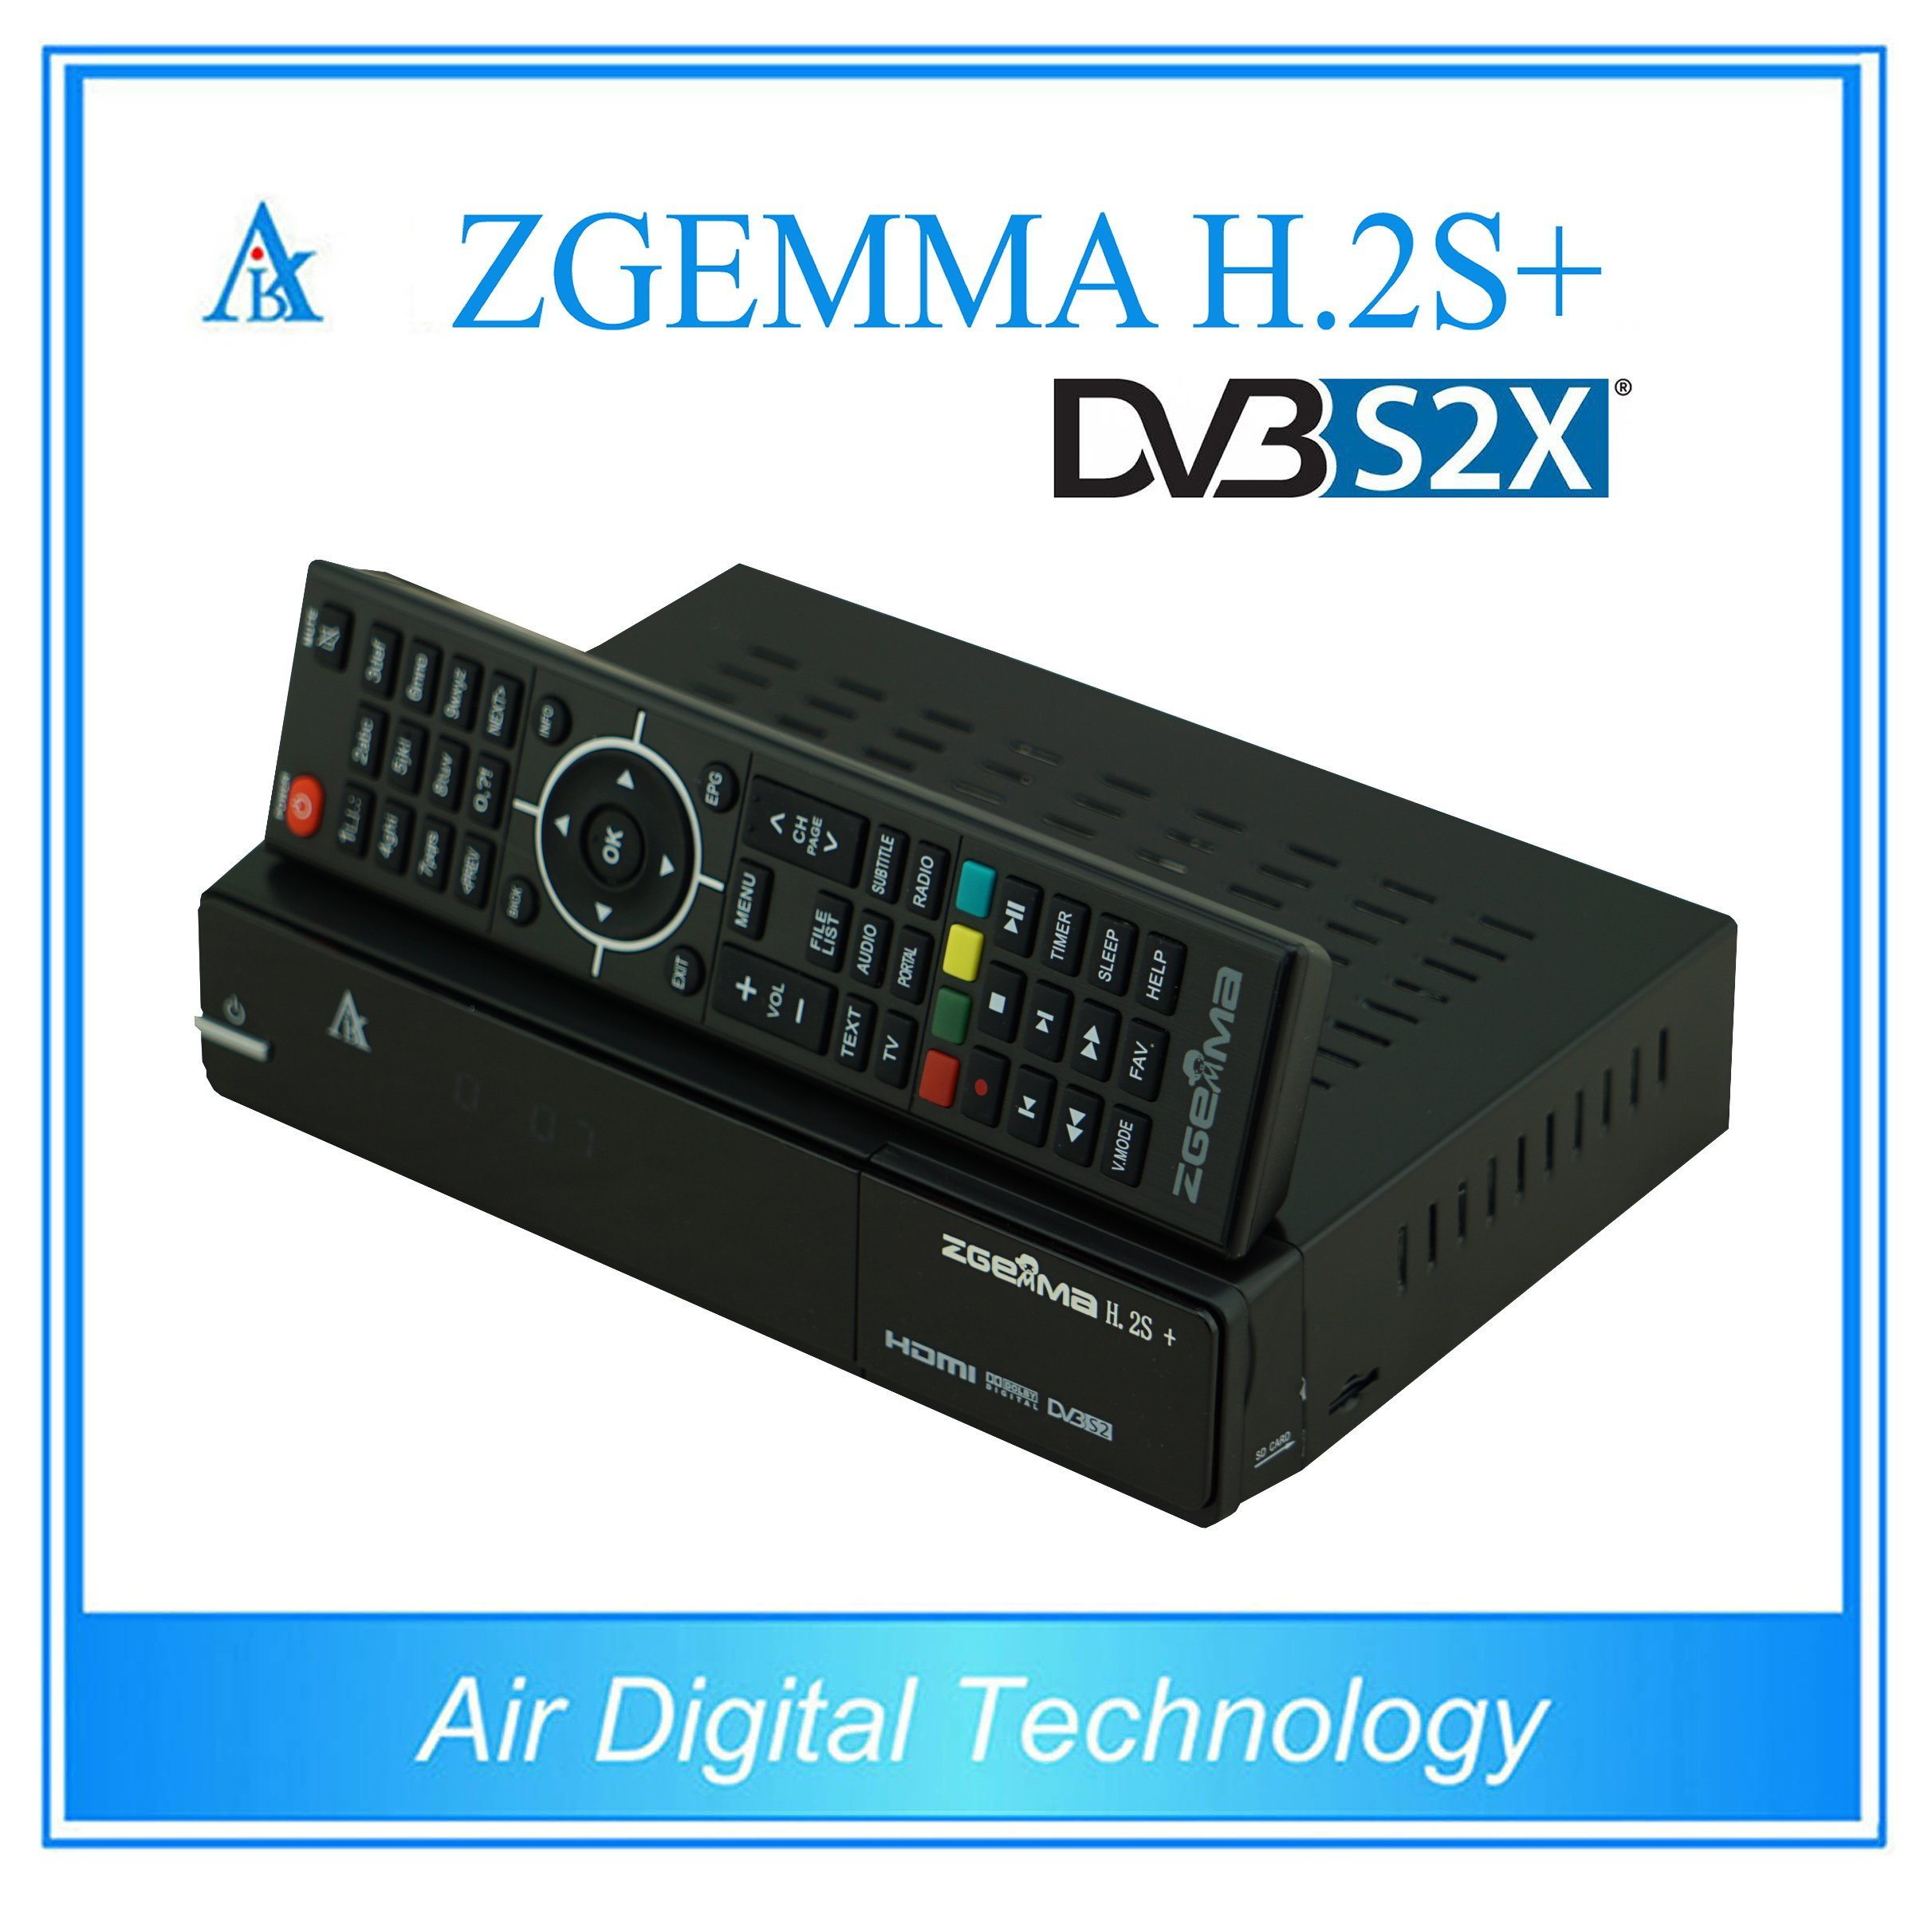 S2X TV Box DVB S2 + DVB S2X + DVB T2/C Zgemma H. 2s+